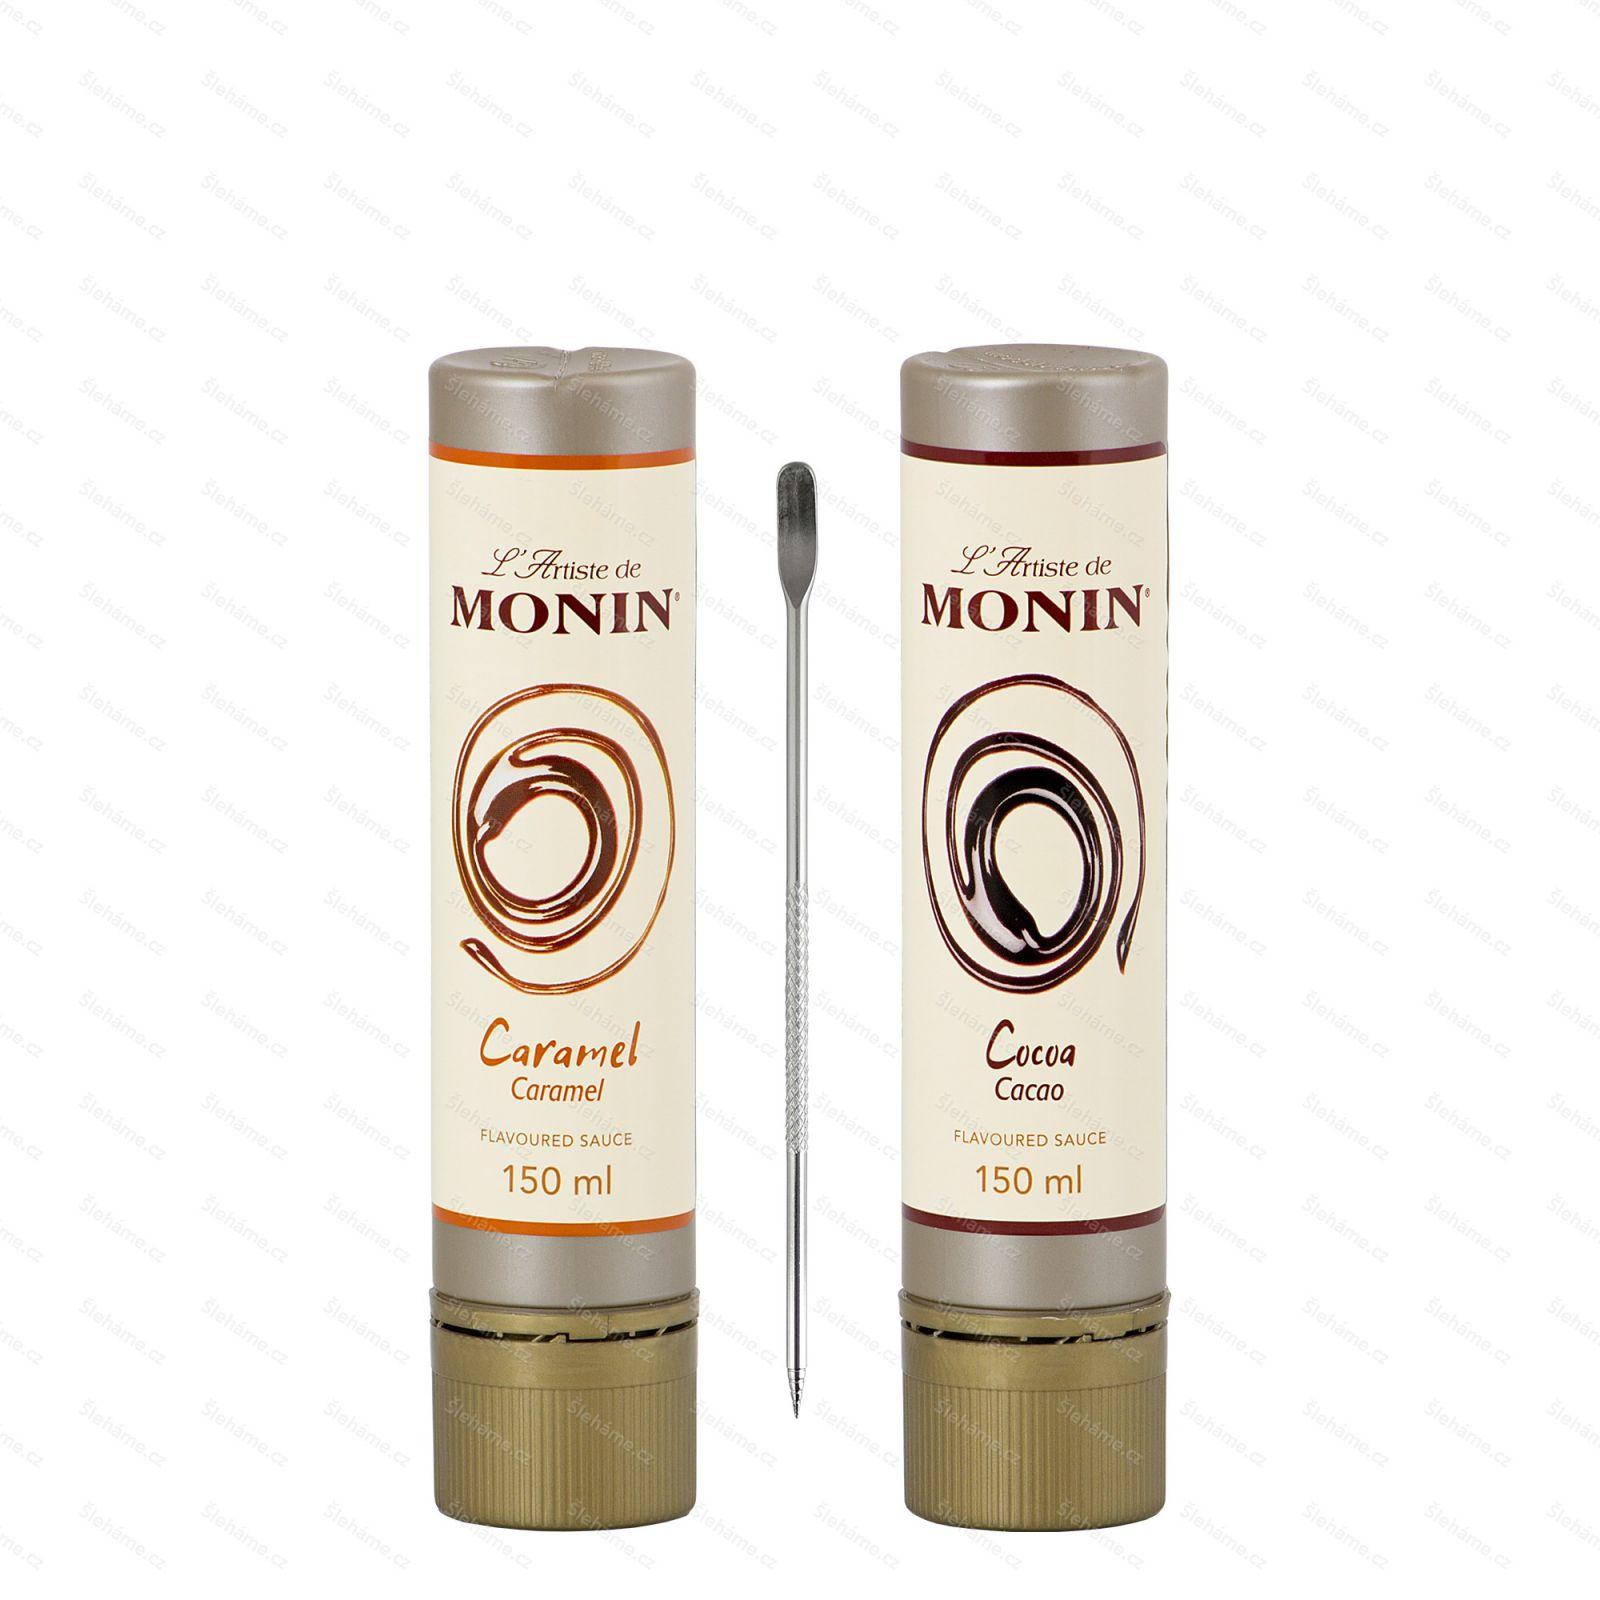 Sada dekoračních topingů L'Artiste de Monin Caramel & Cocoa